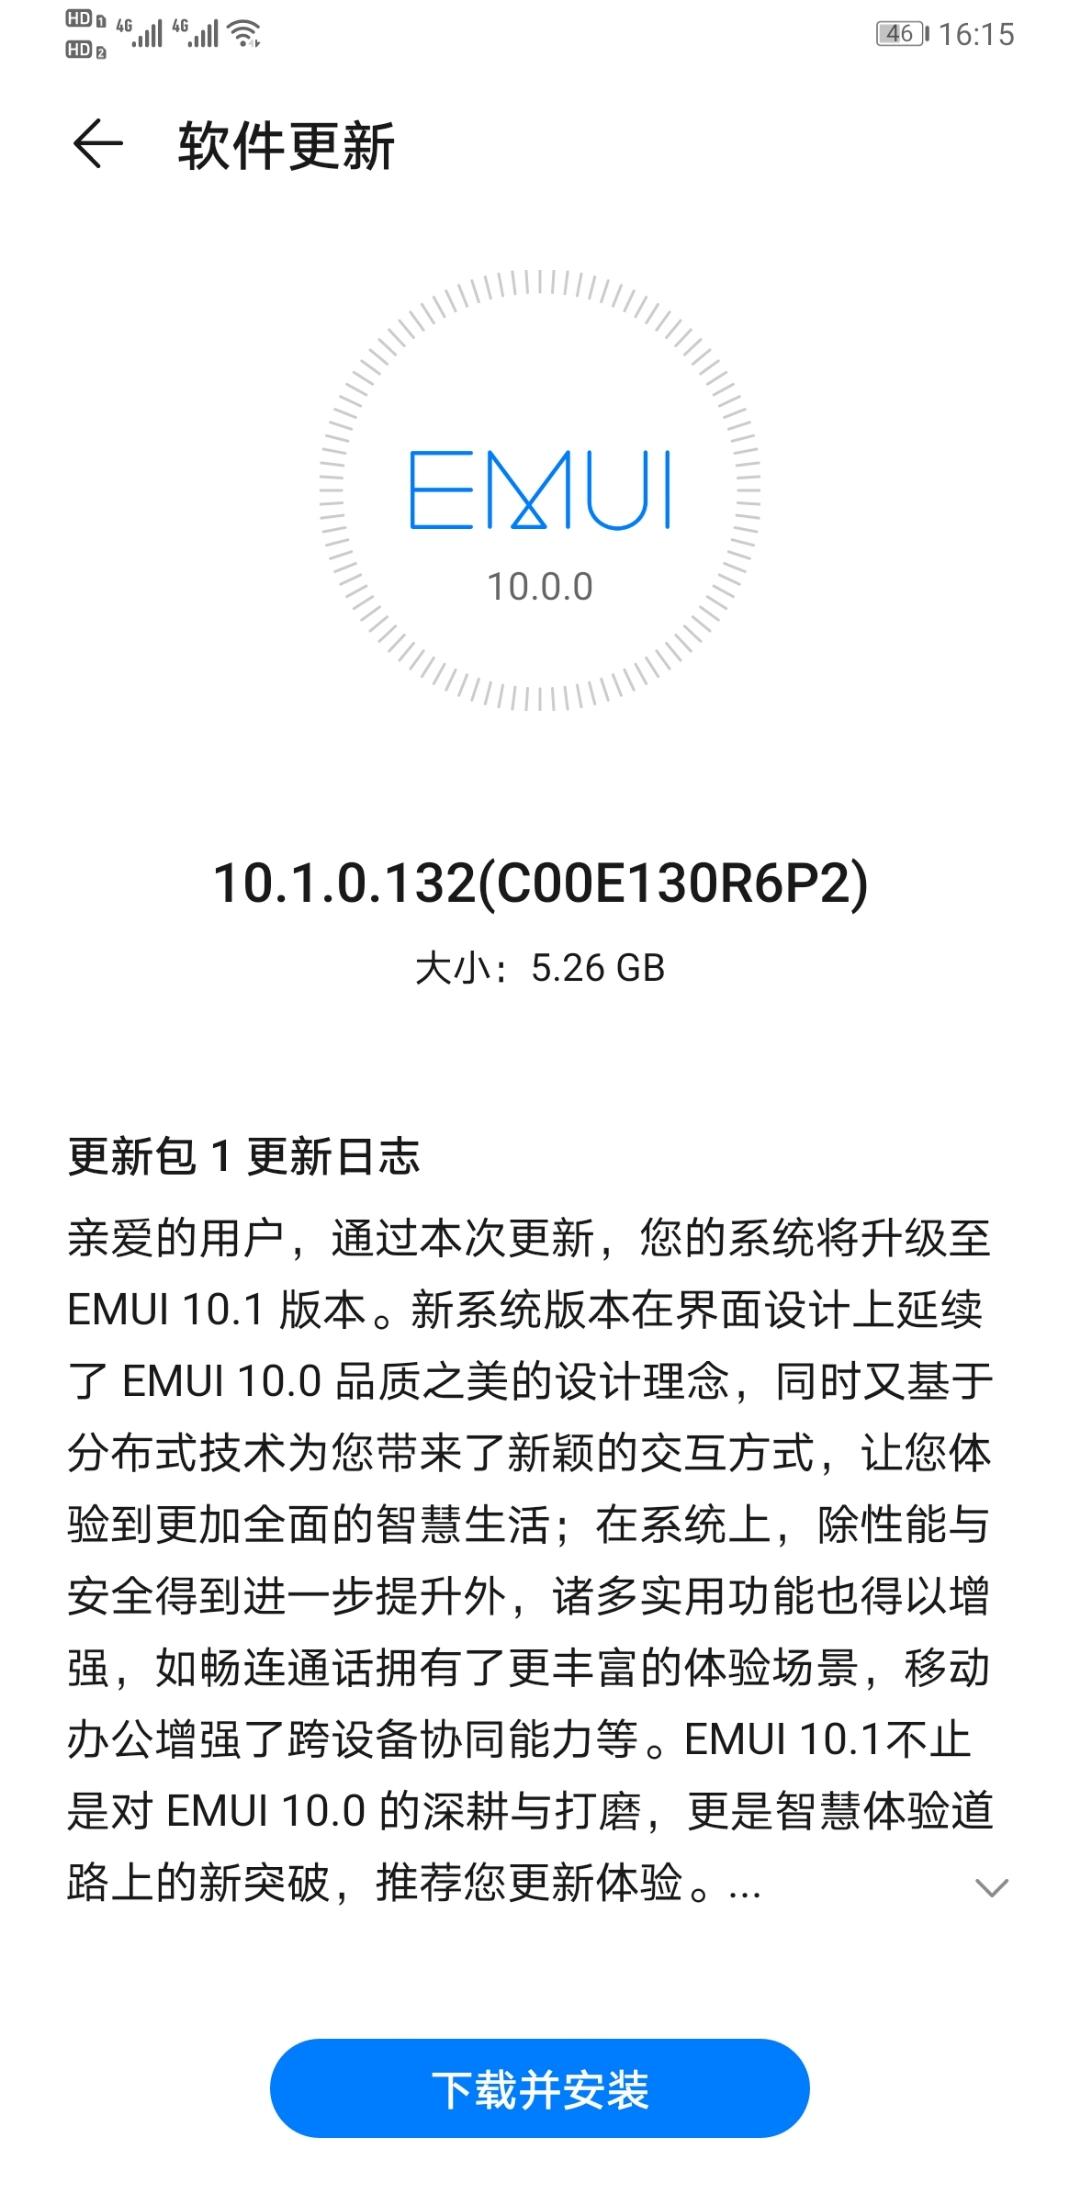 Screenshot_20200516_161548_com.huawei.android.hwouc.jpg